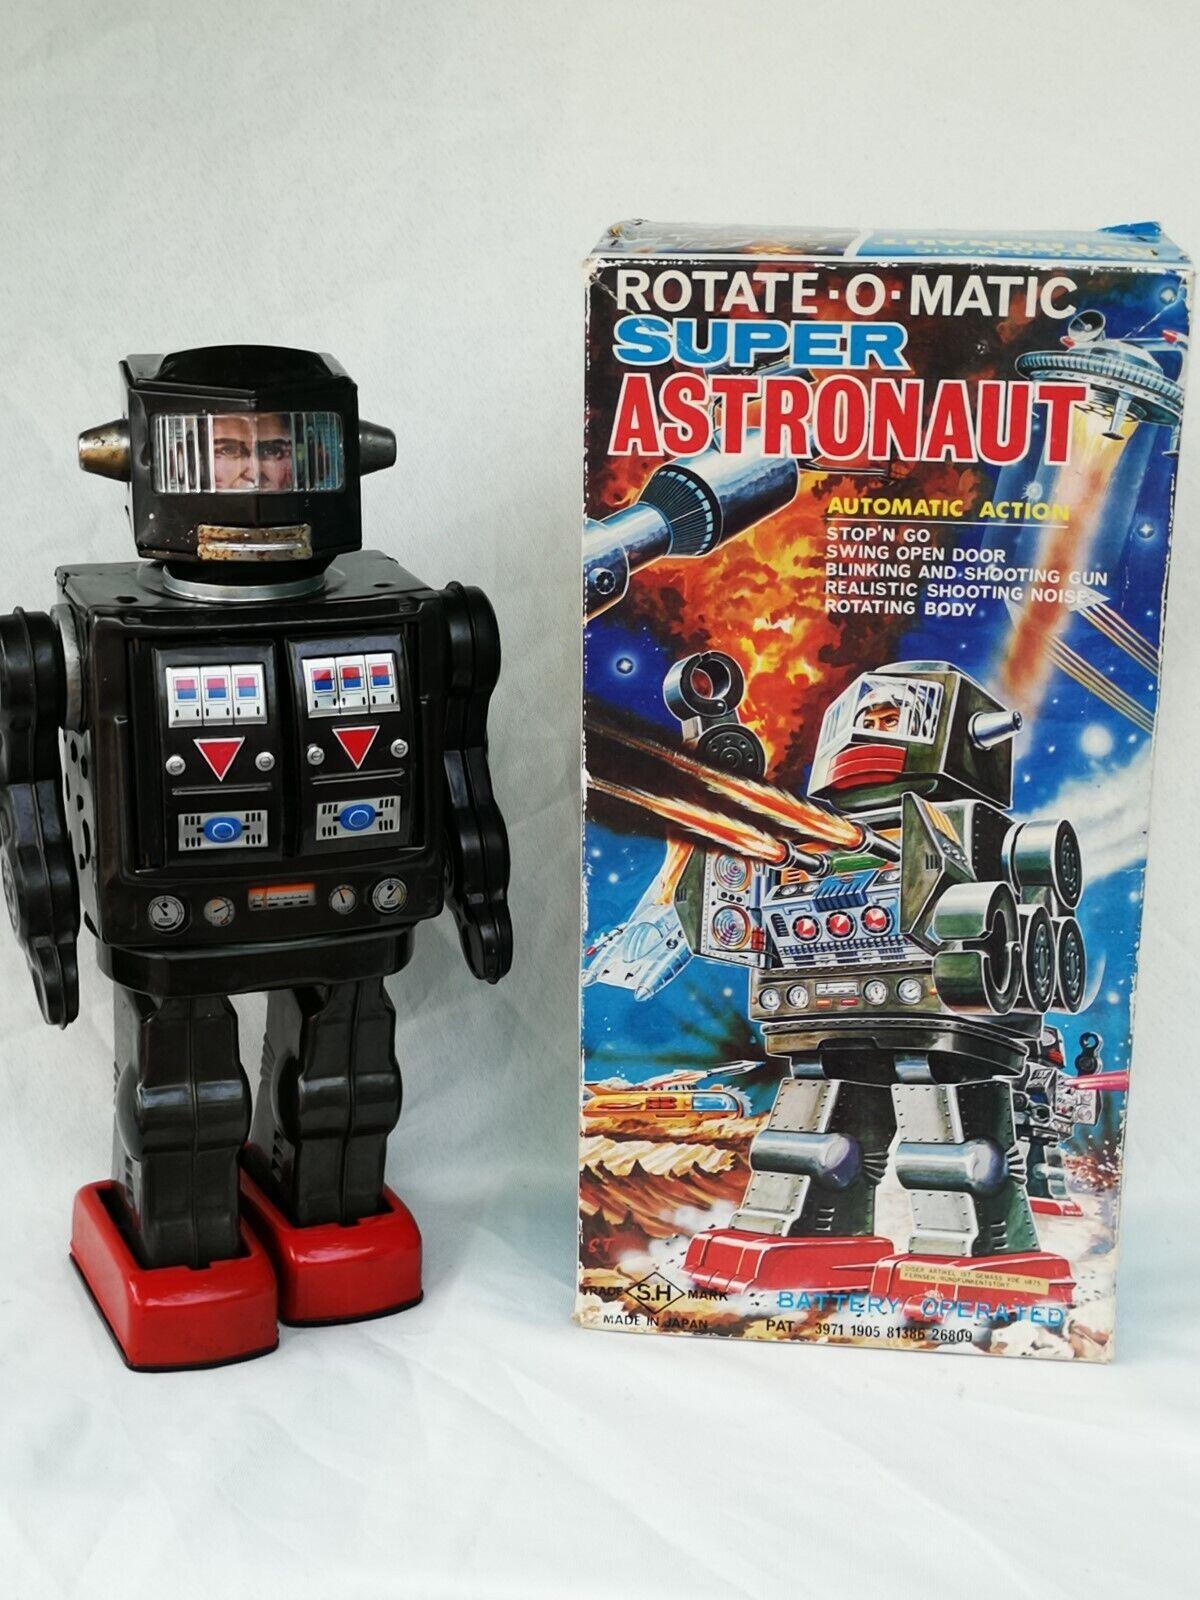 Horikawa SH Japan Super Astronaut Robot Rotate-O-Matic Blechspielzeug Boxed